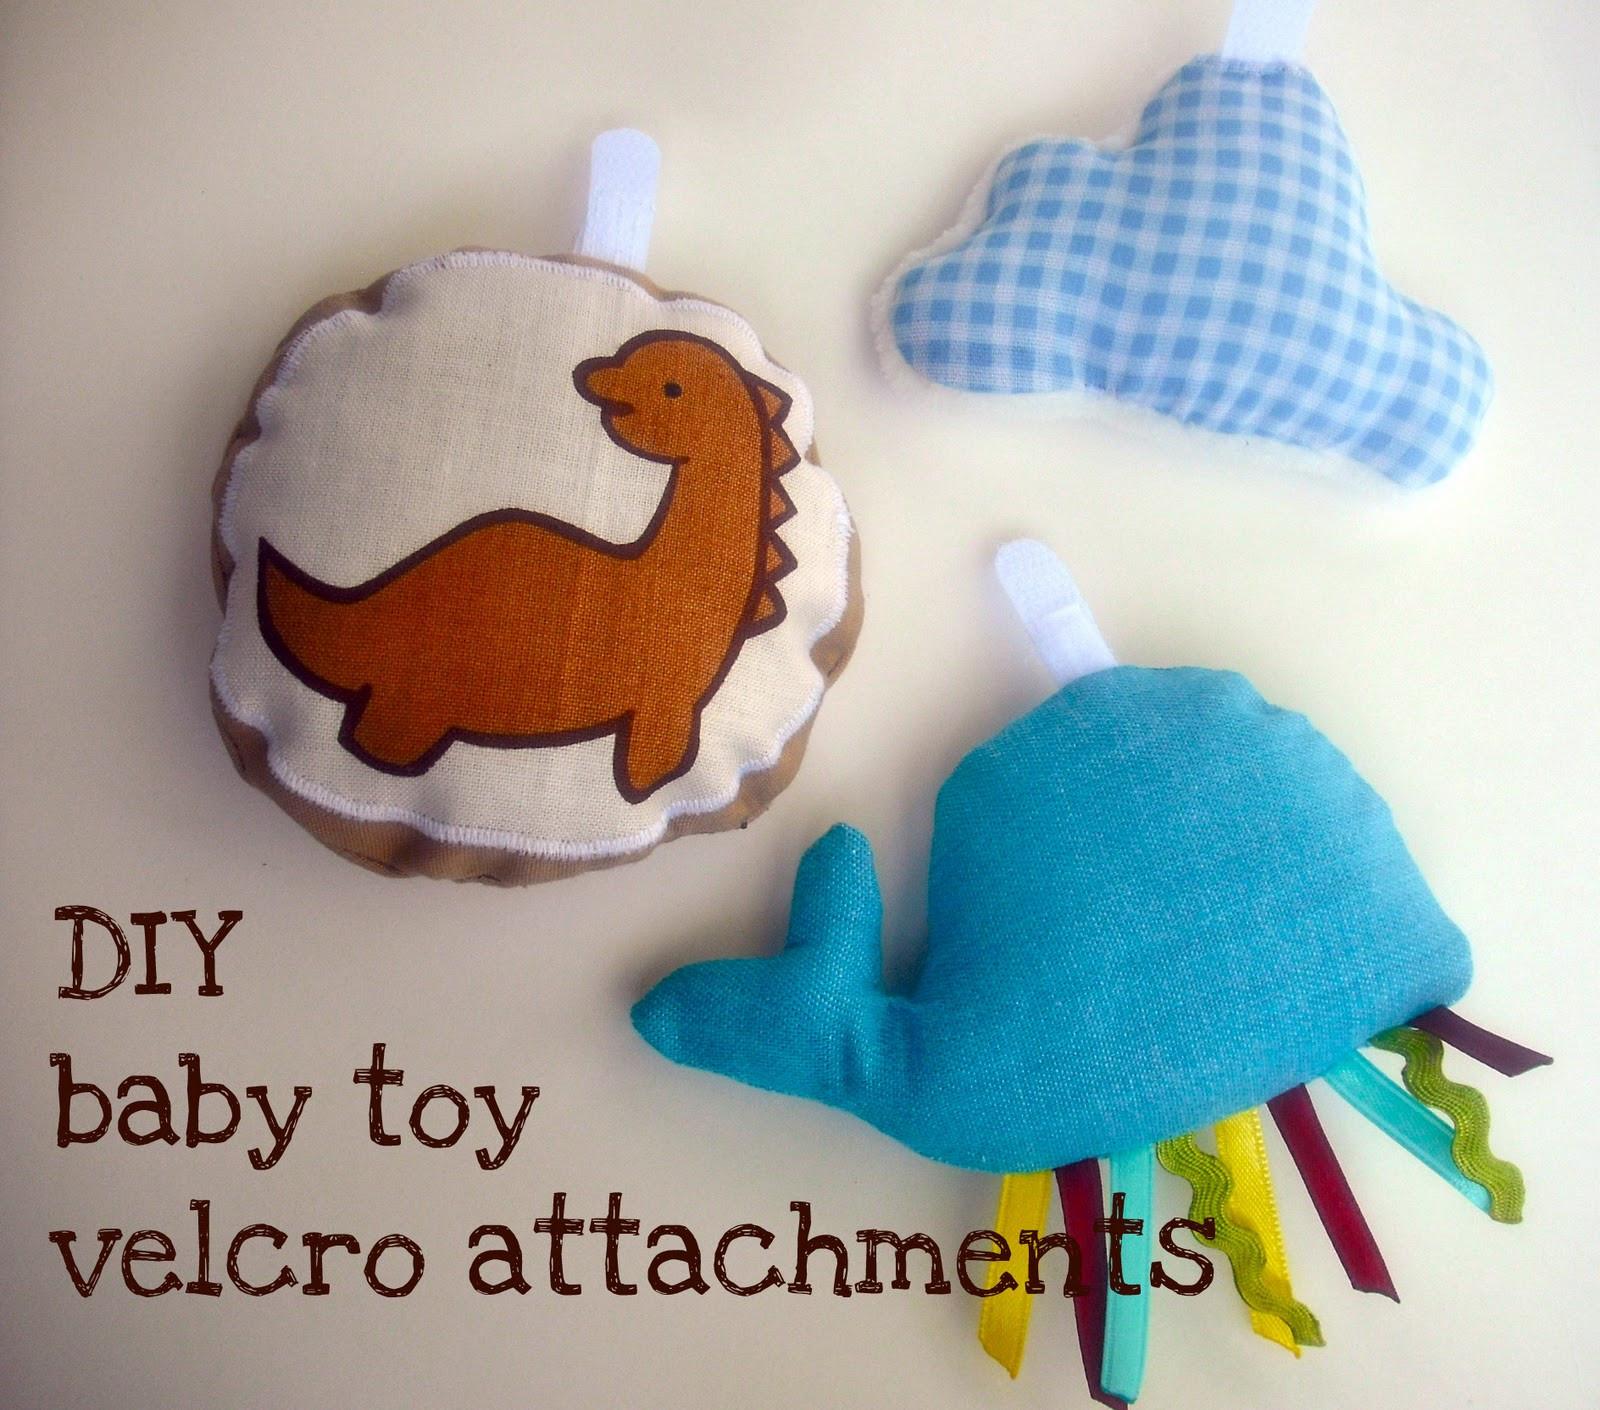 Baby Diy  bedtime tales DIY baby toy velcro attachments